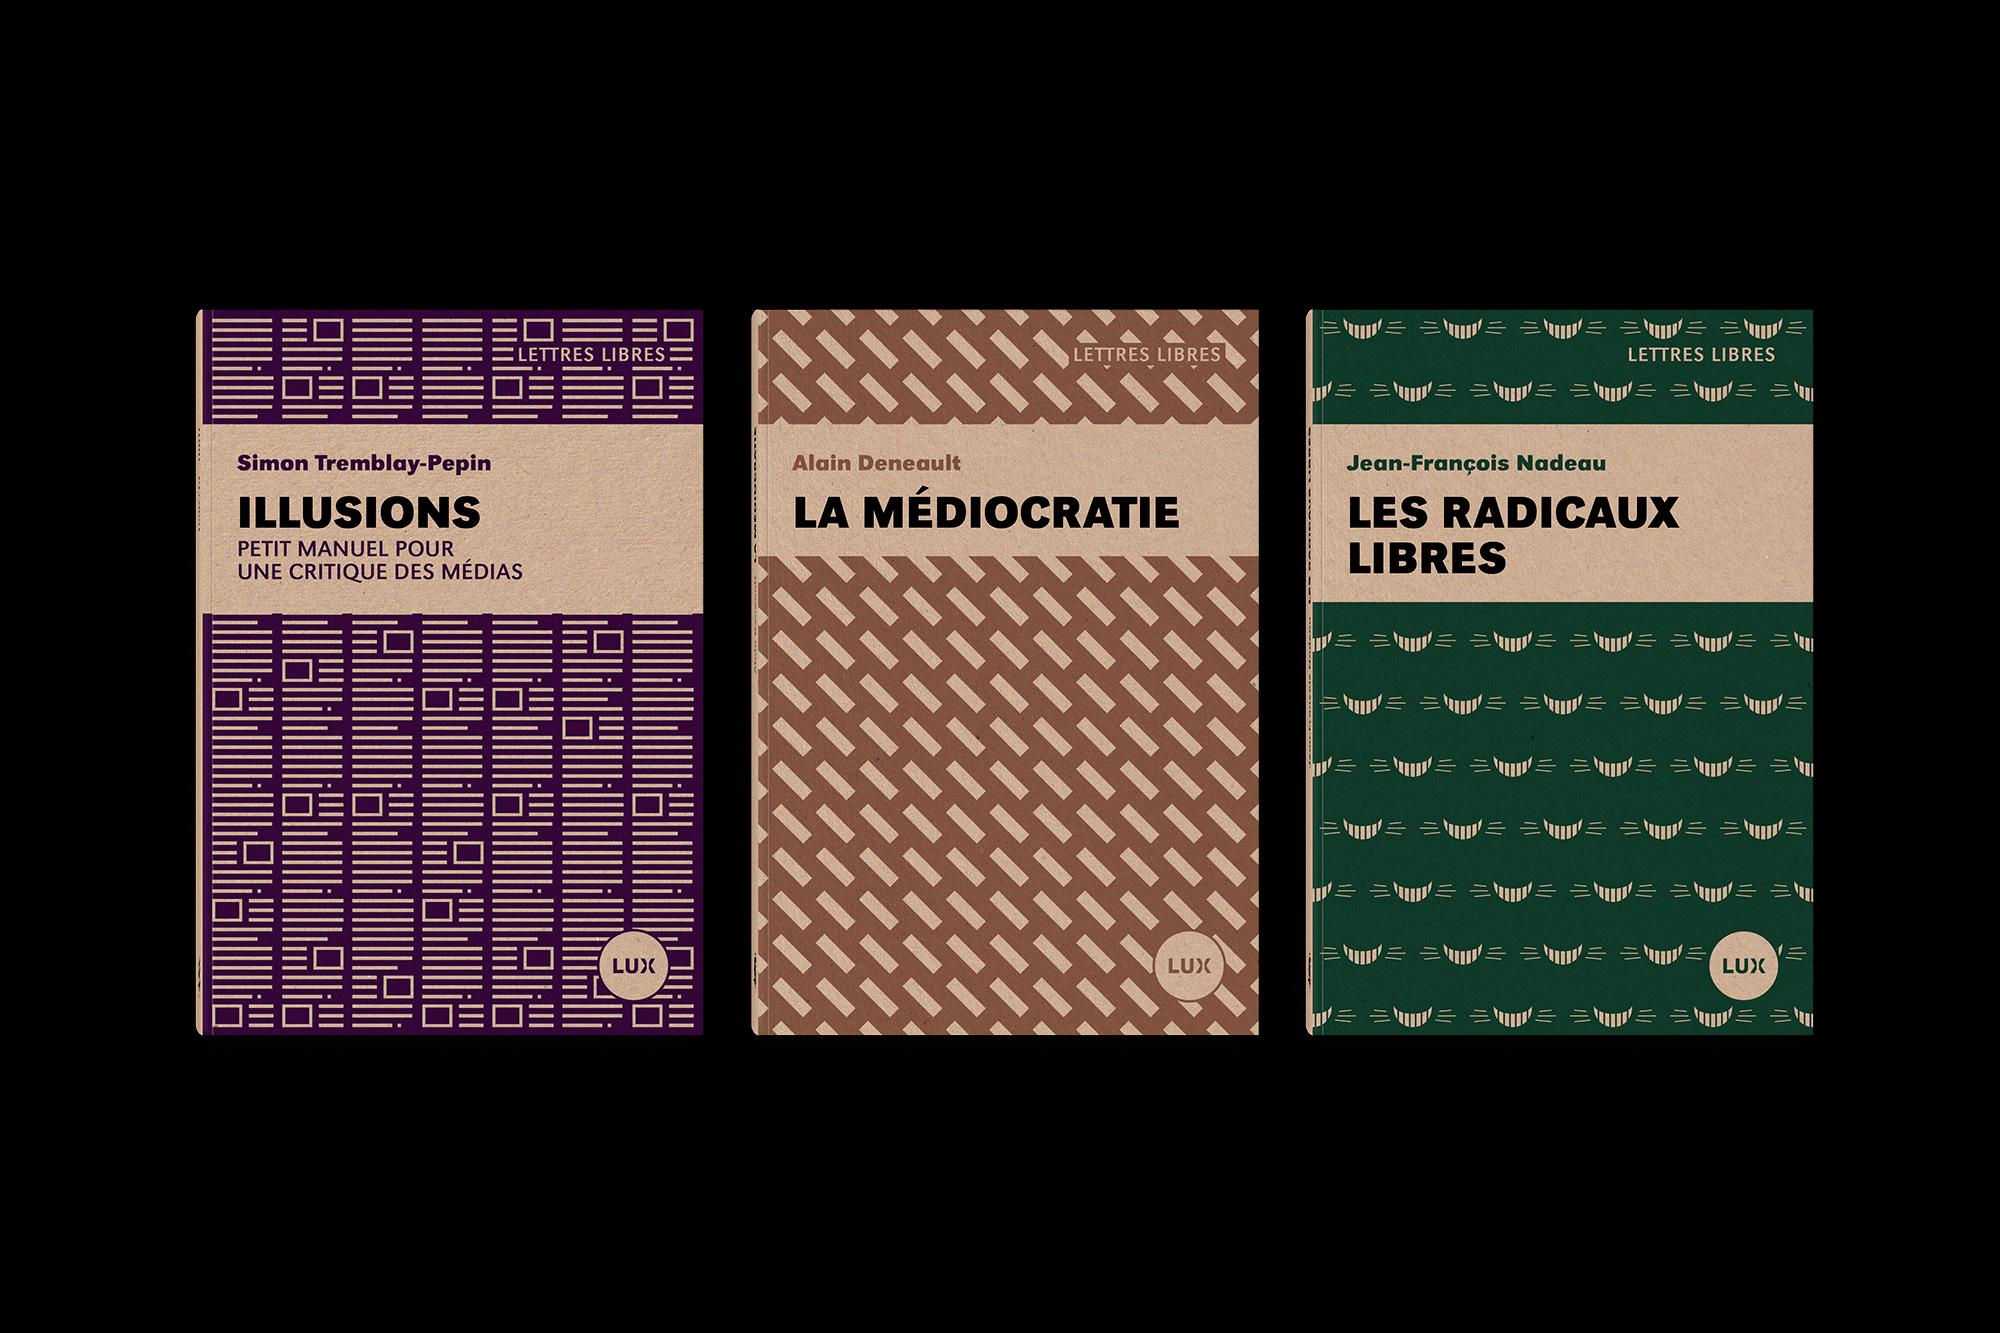 Lettres-libres-mockup-couvertures-4-5-6